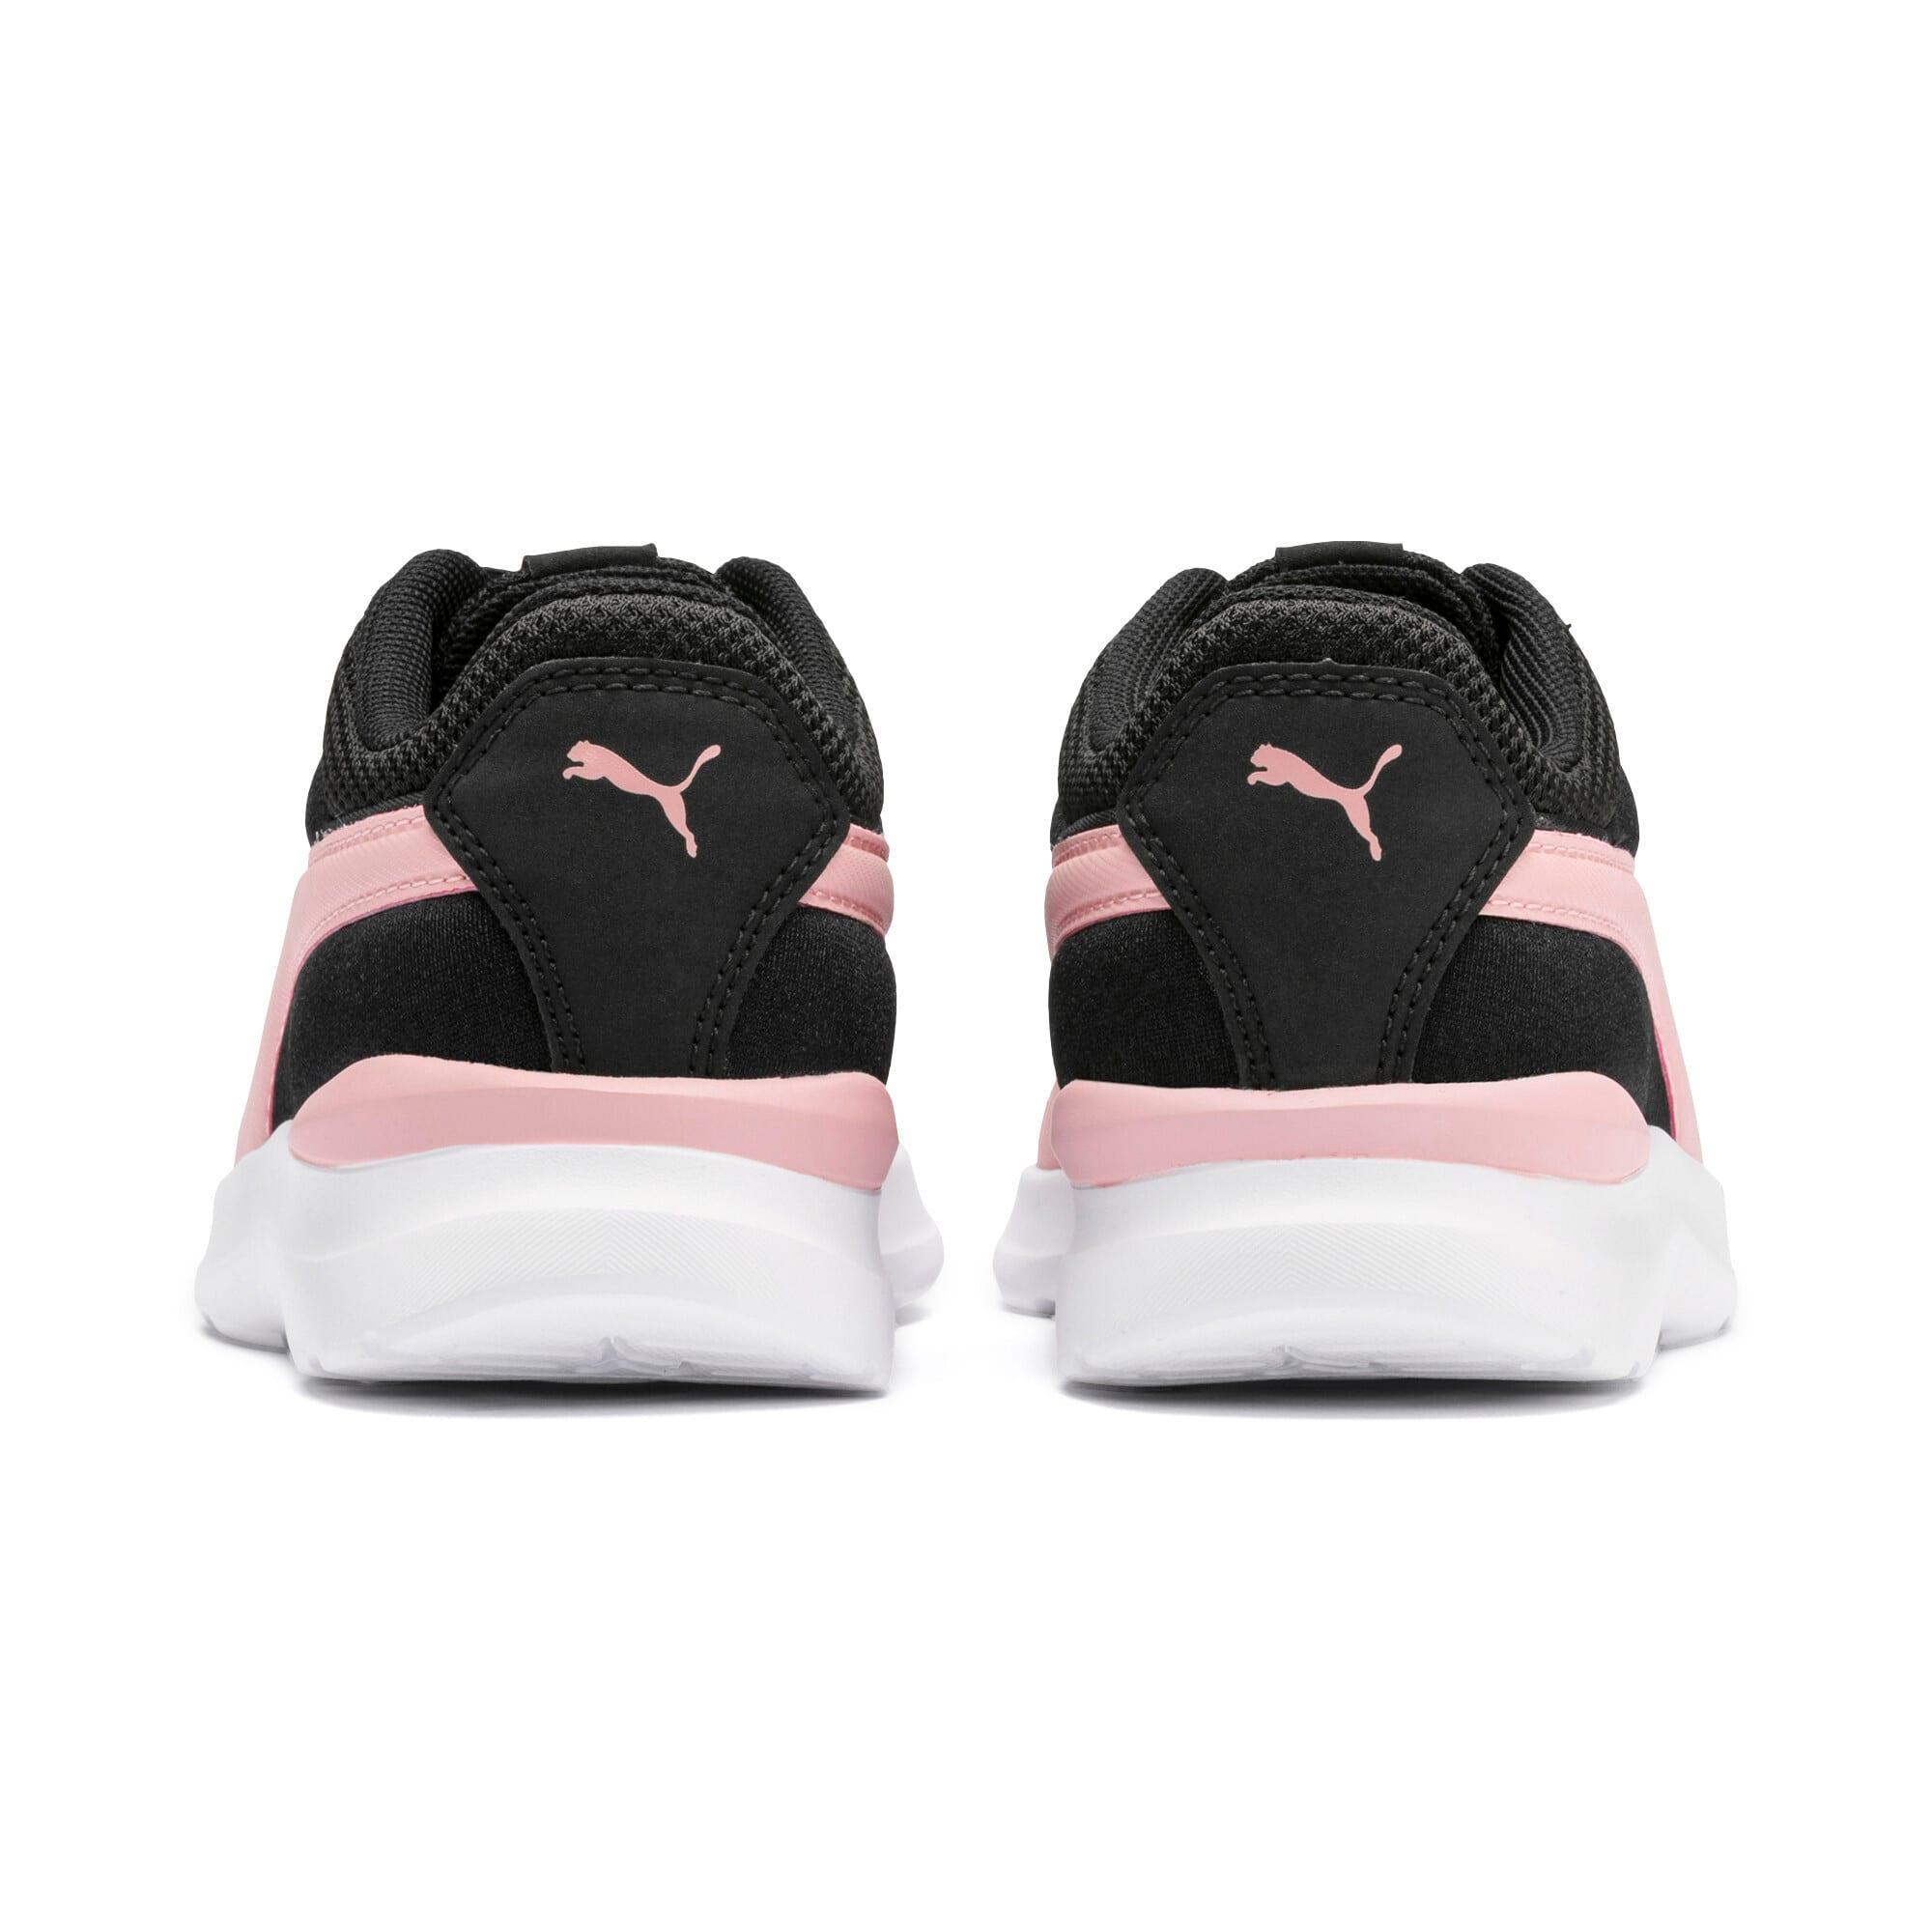 Thumbnail 4 of Adela AC Girl's Little Kids' Shoes, Puma Black-Bridal Rose, medium